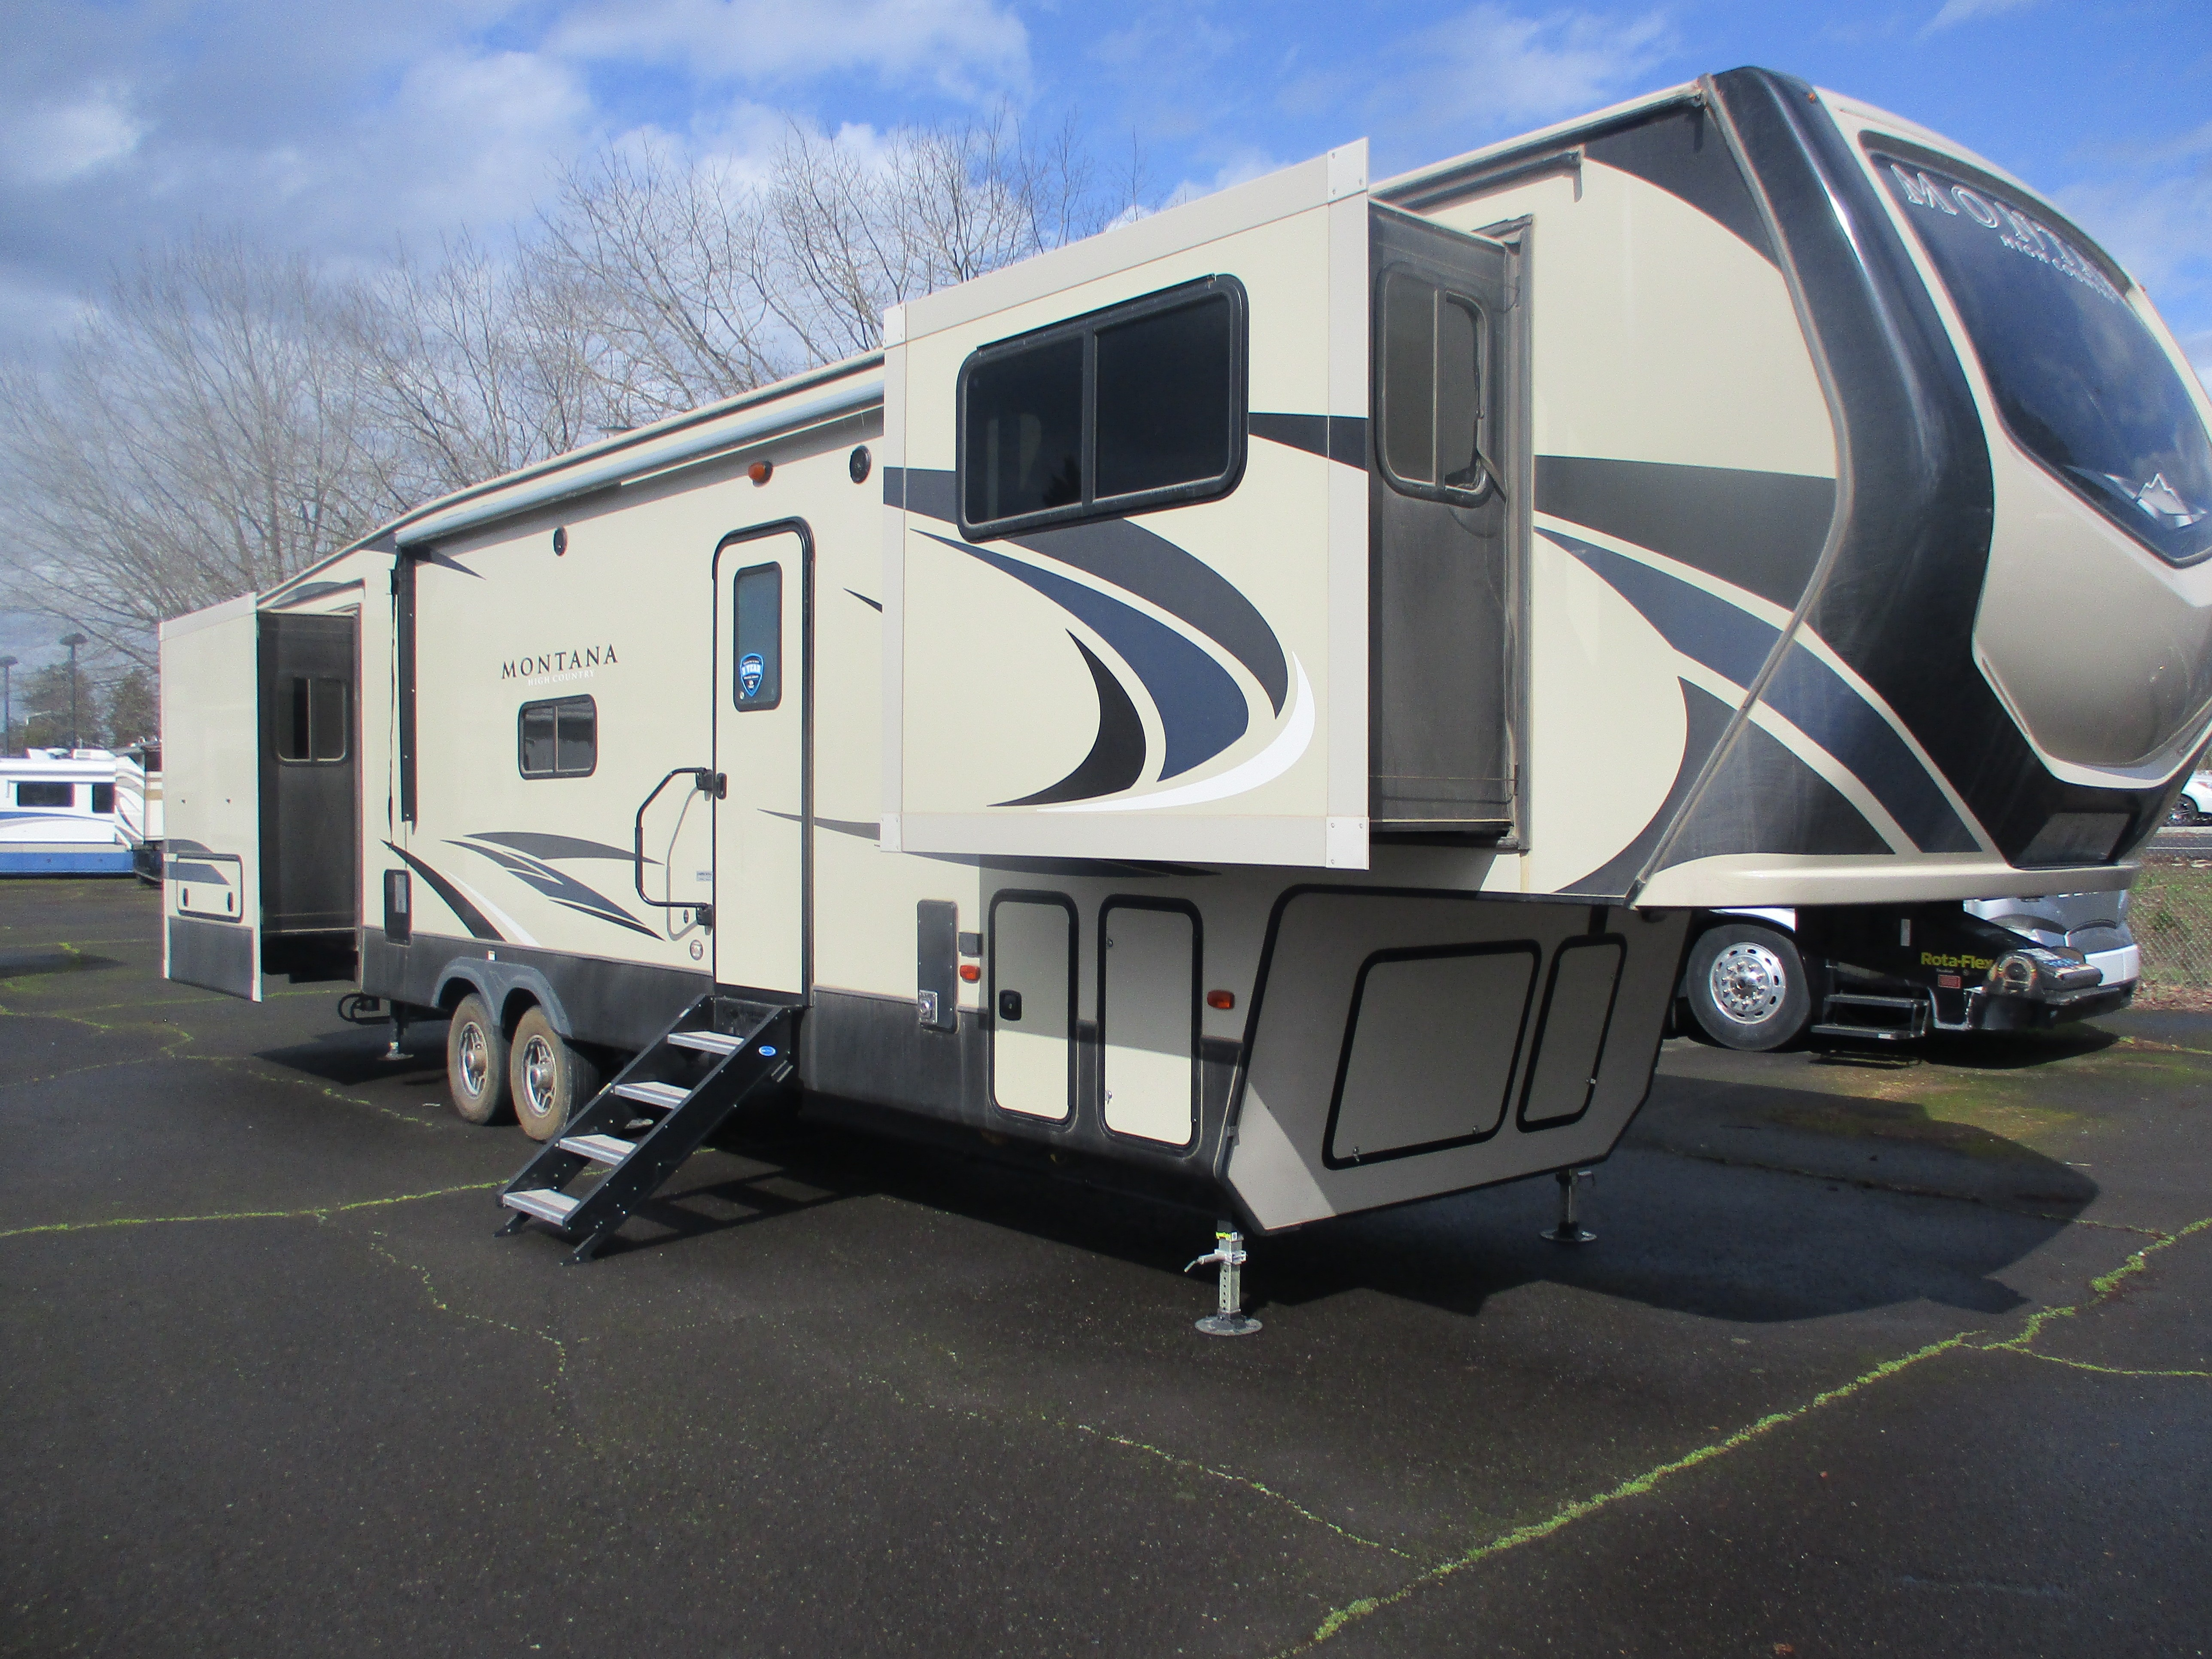 Used, 2019, Keystone, Montana High Country 375FL, Fifth Wheels